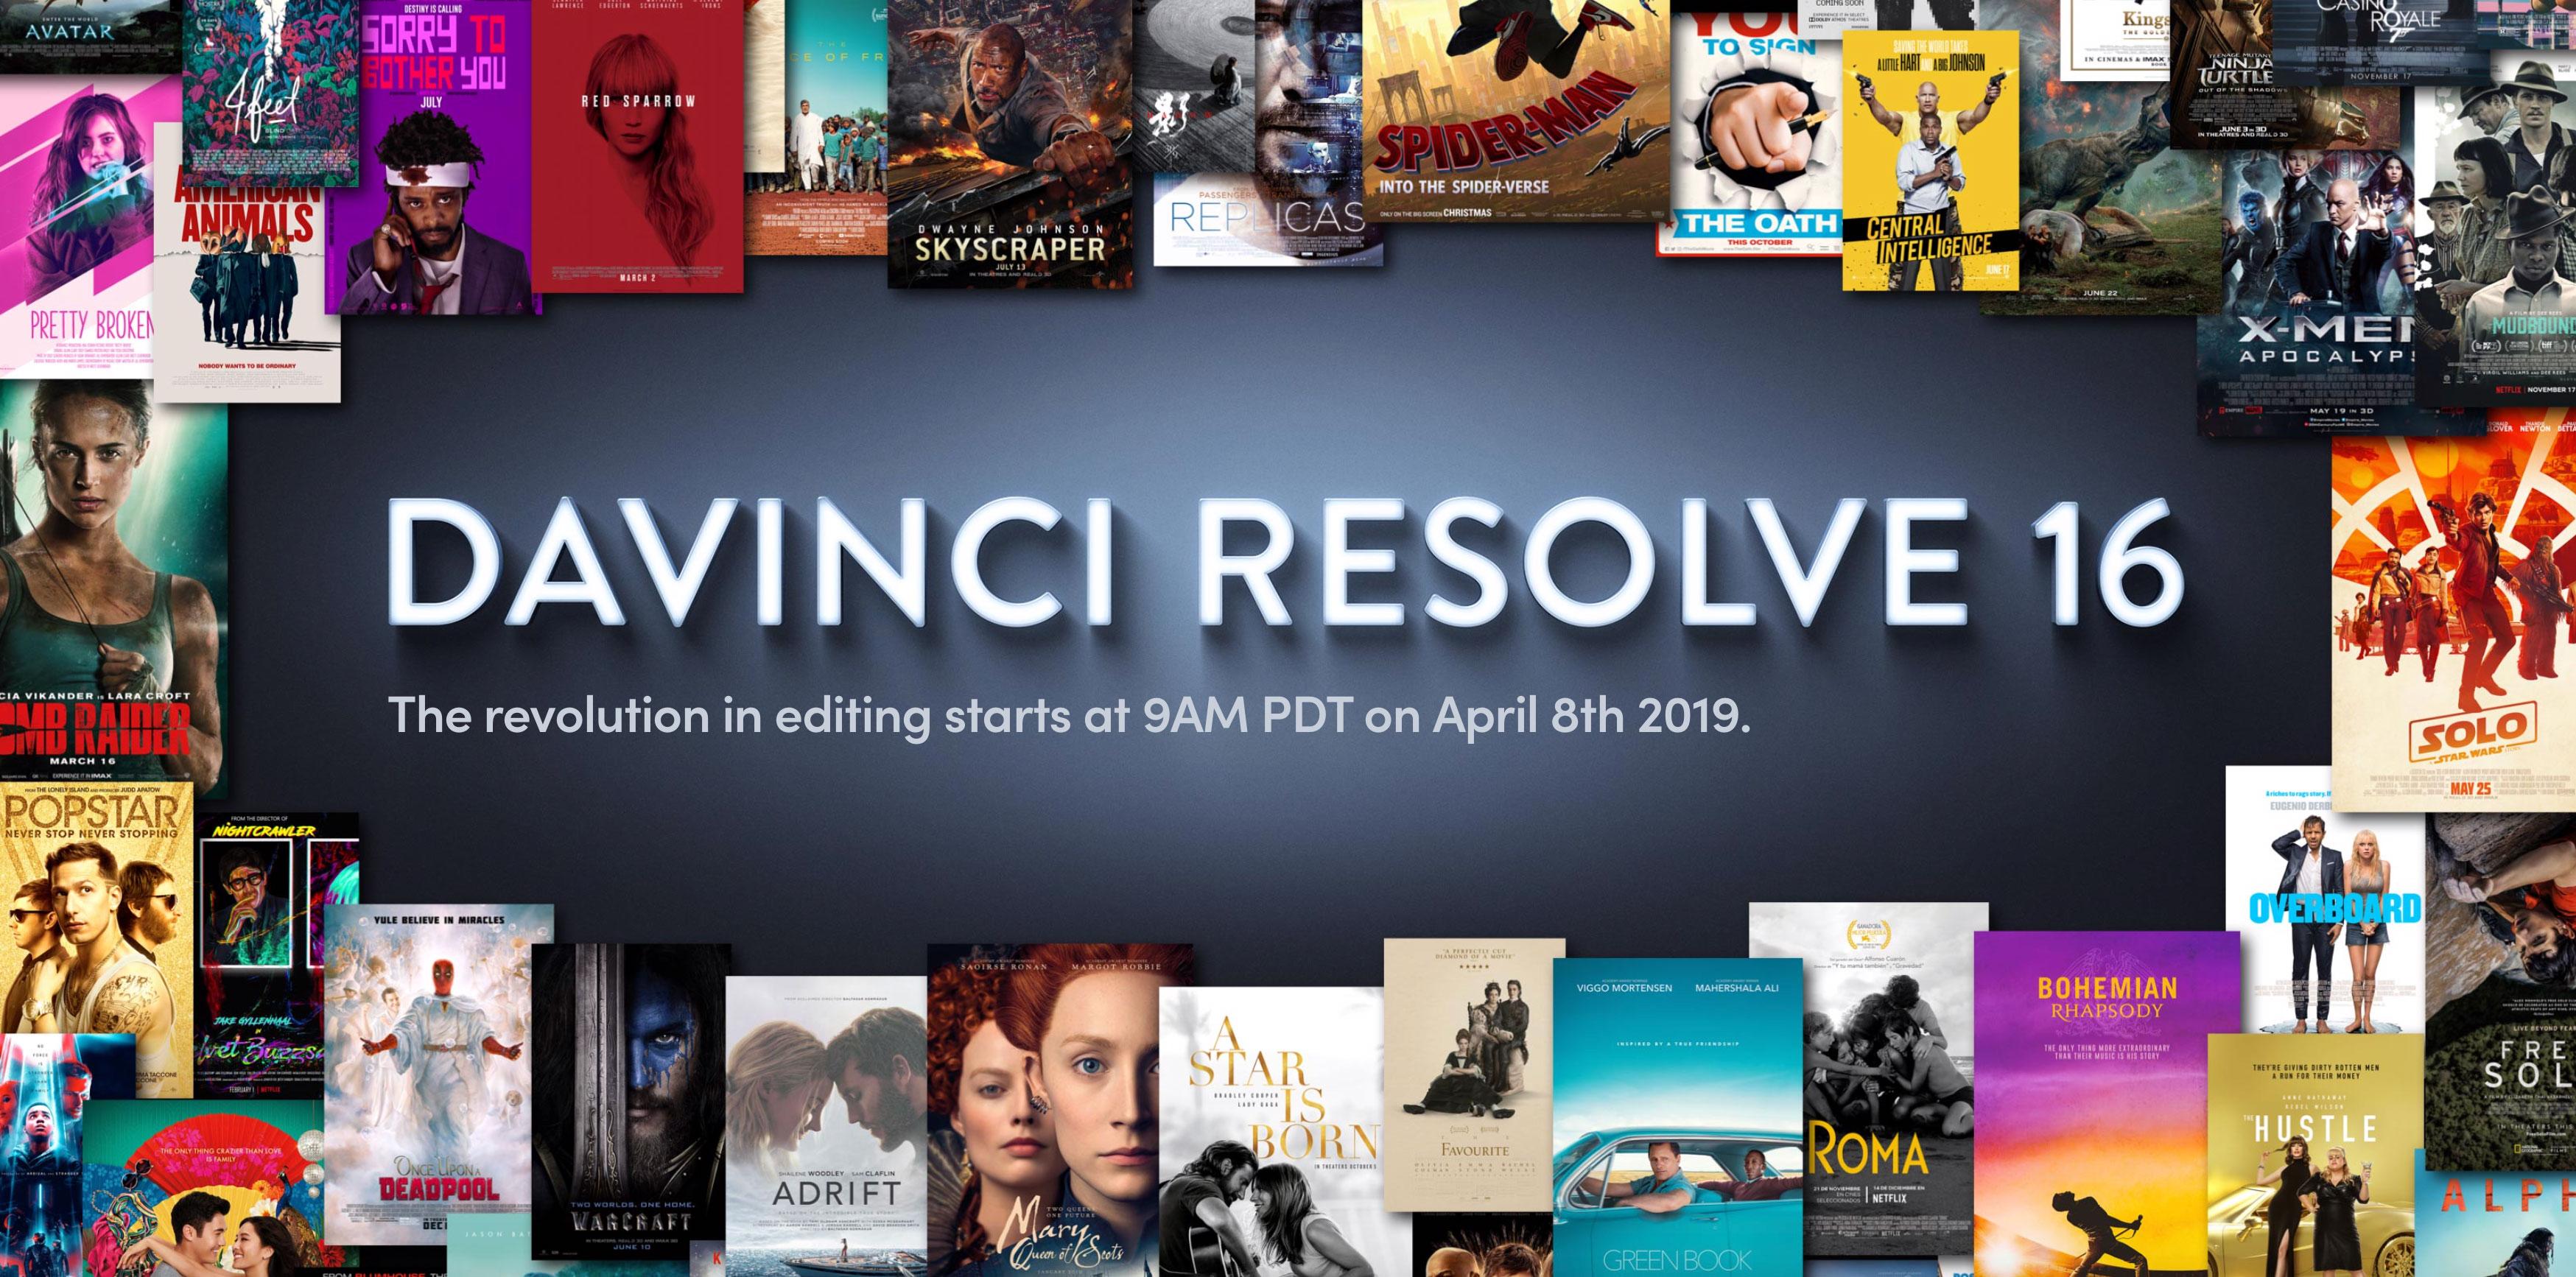 davinci-resolve-16.jpg